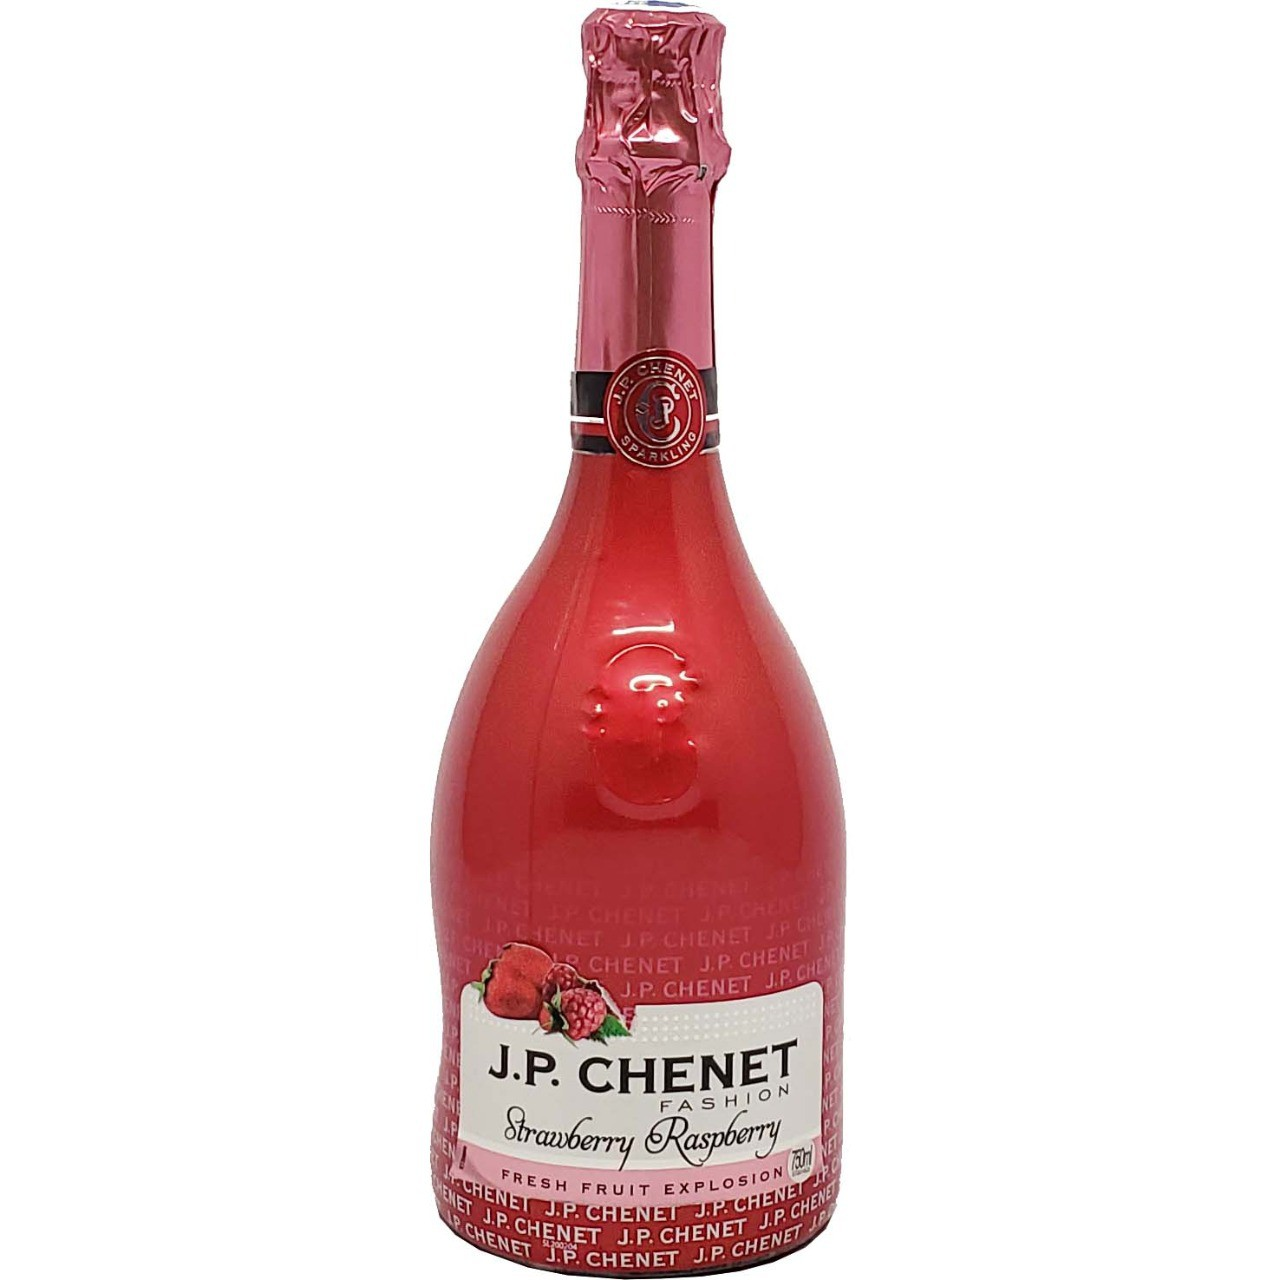 Espumante J.P Chenet Fashion Strawberry Raspberry - 750ml -